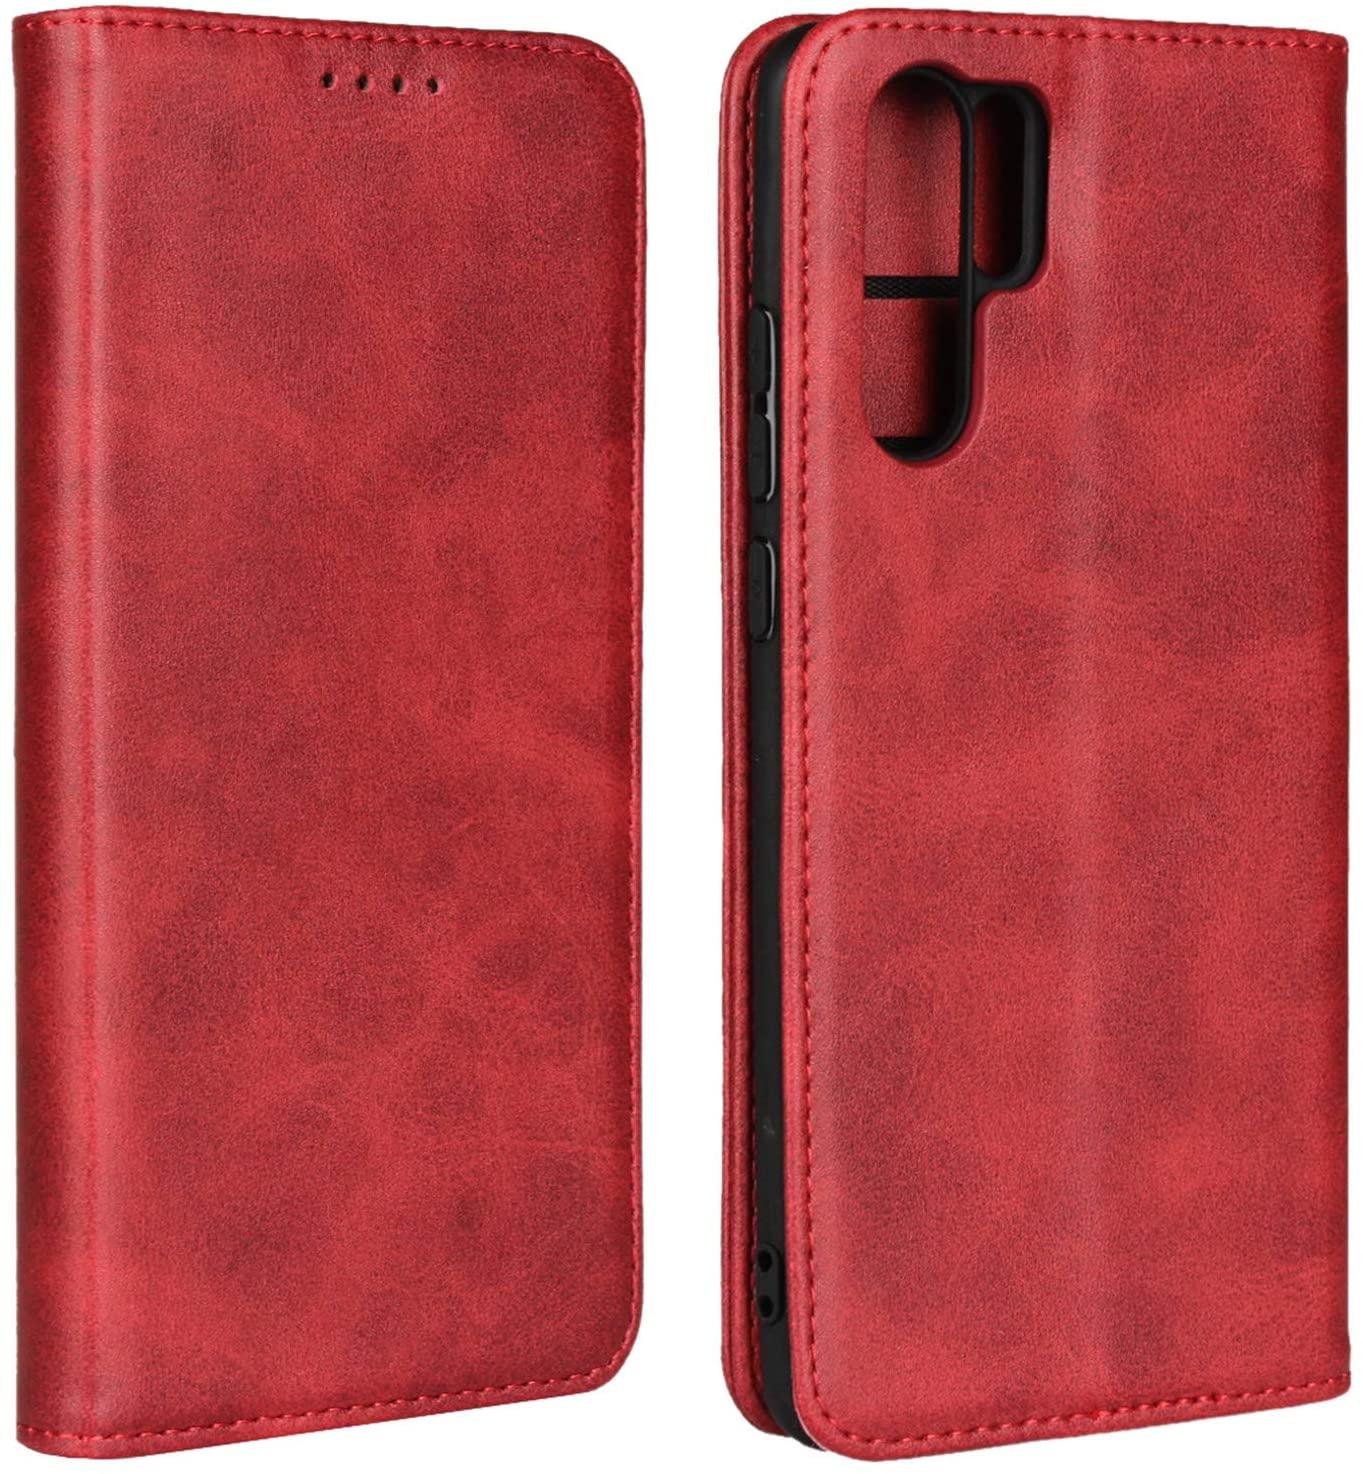 Zouzt Premium Pu Leather Wallet case Compatible Huawei p30 pro,Folio Flip Case Magnetic Closure/Kickstand Feature/Card Slots(Red)